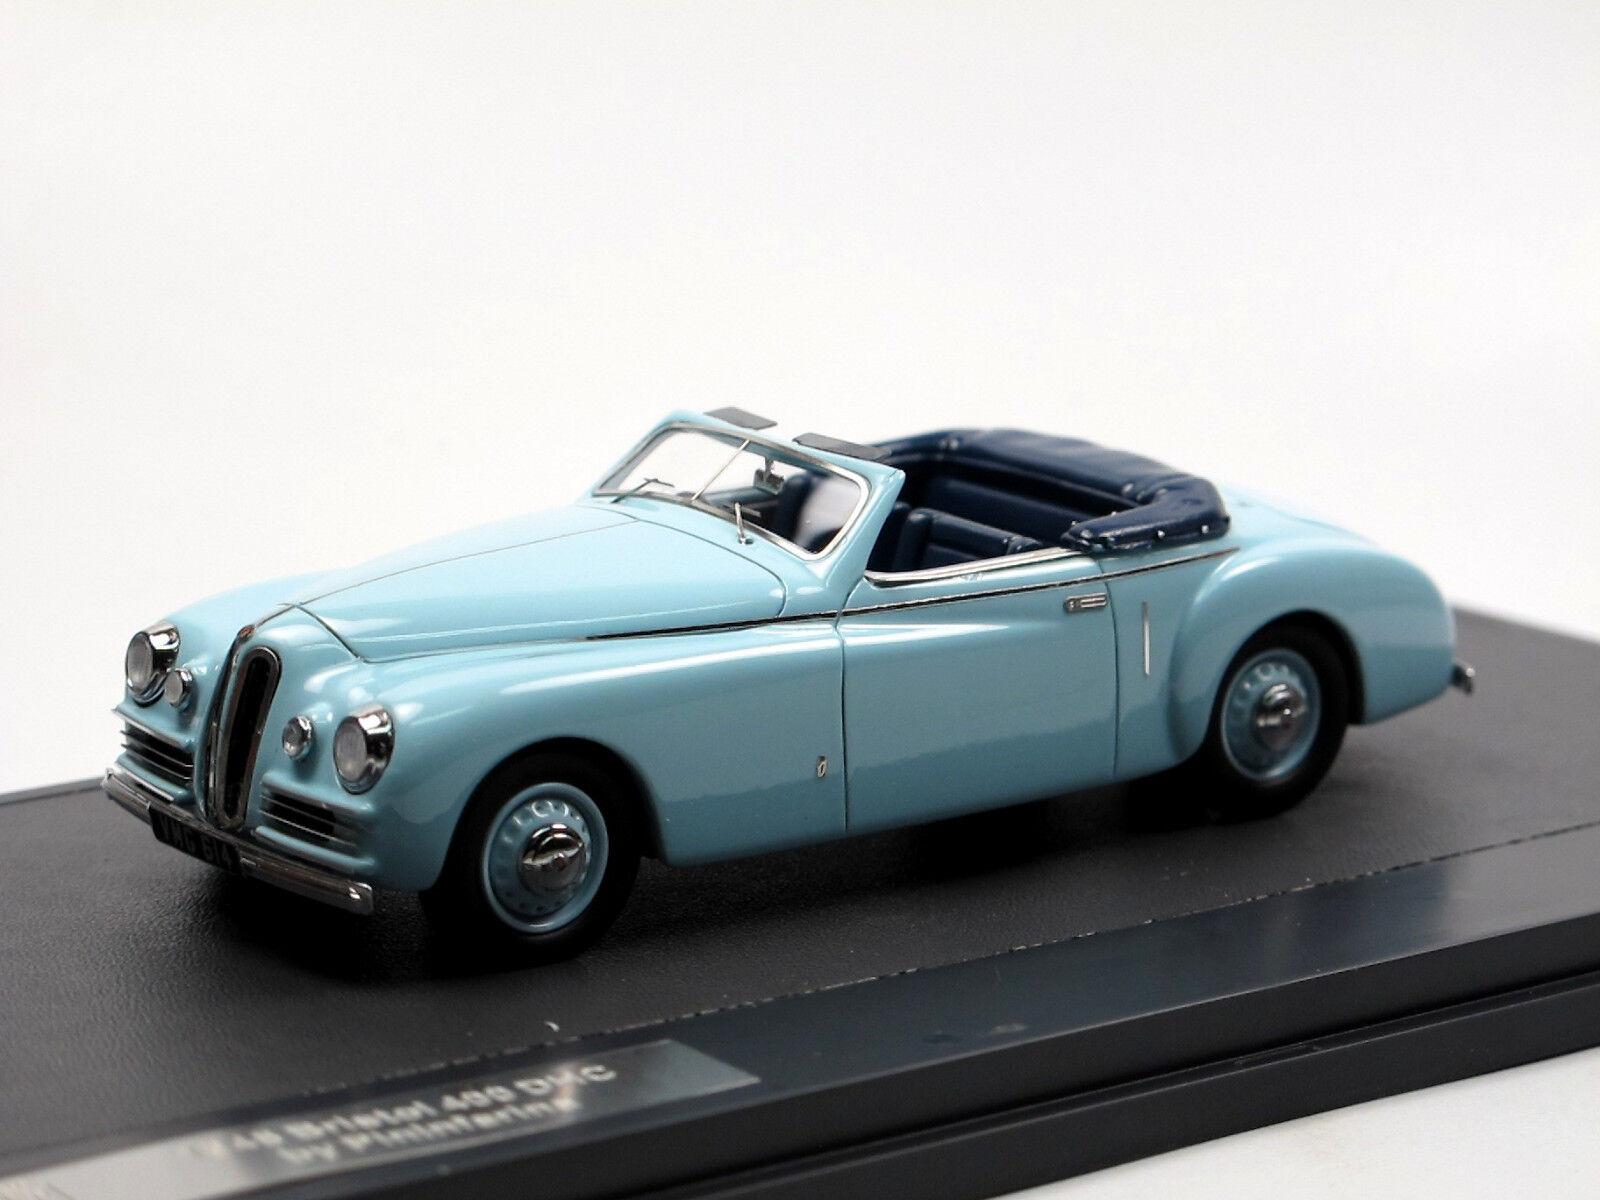 Matrix - modellen 1948 bristol 400 fernwärme   fernkälte - drophead coupé von pininfarina 1   43